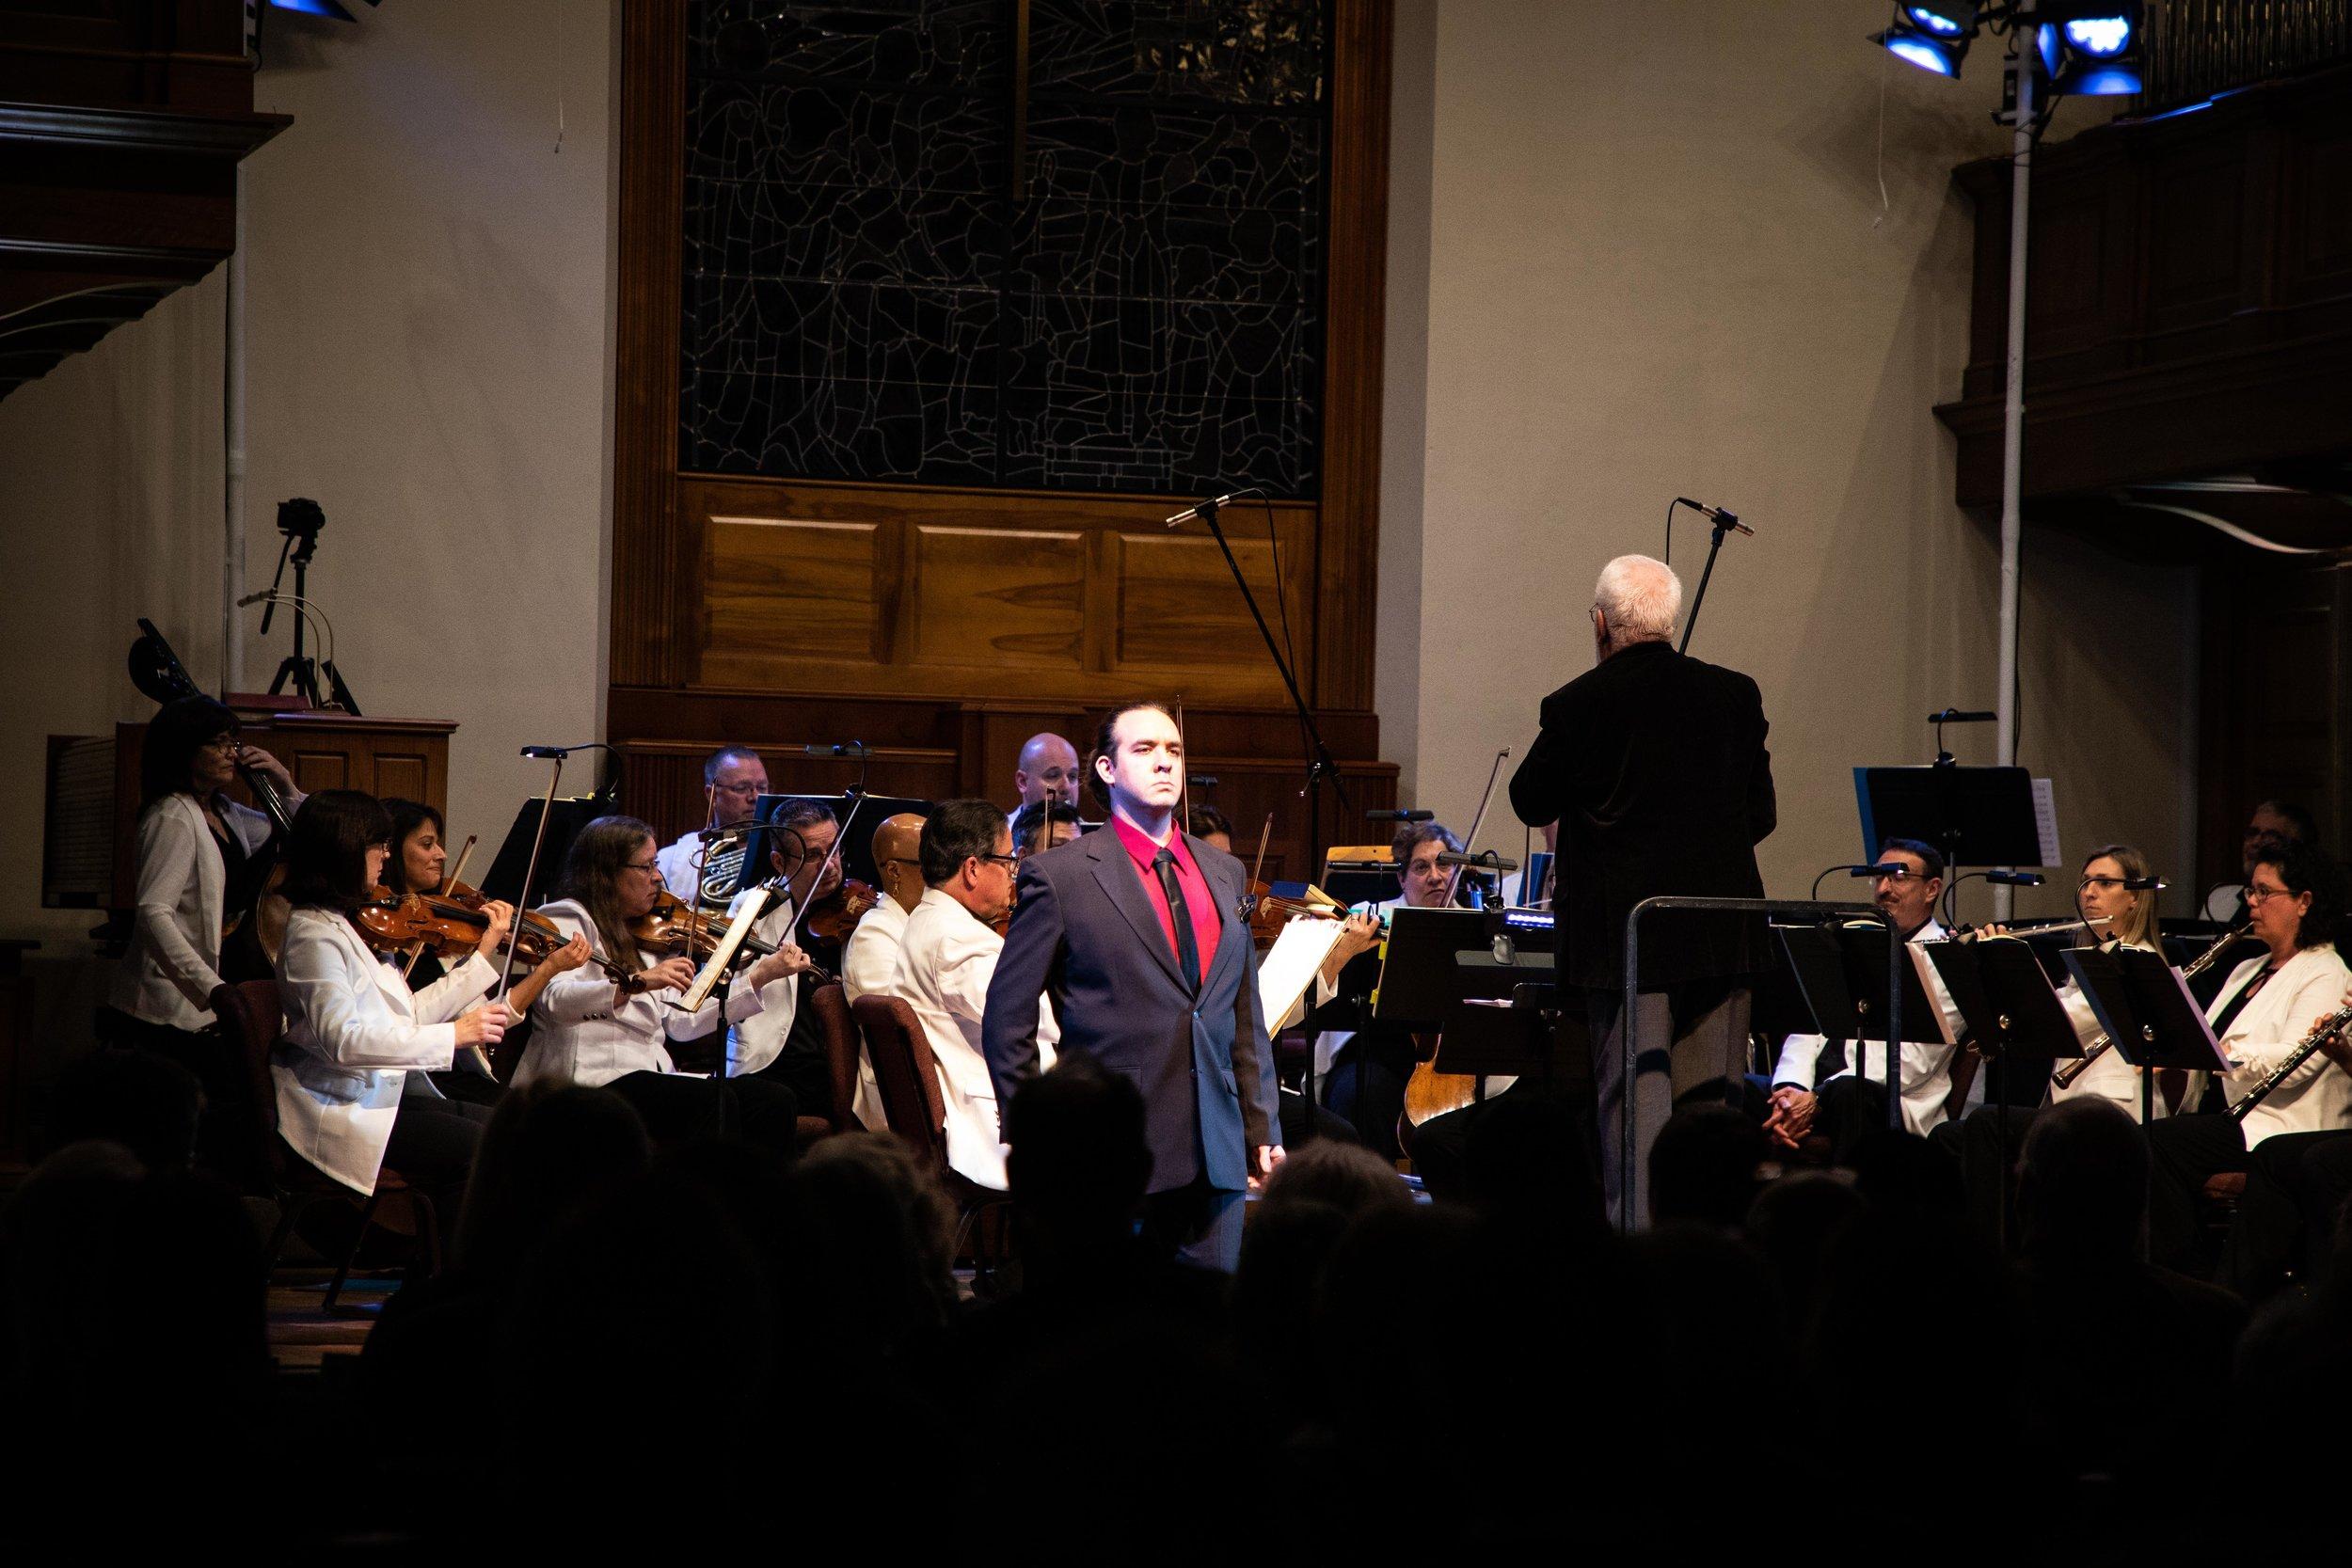 Tenor Joseph Michael Brent, MDLO Orchestra